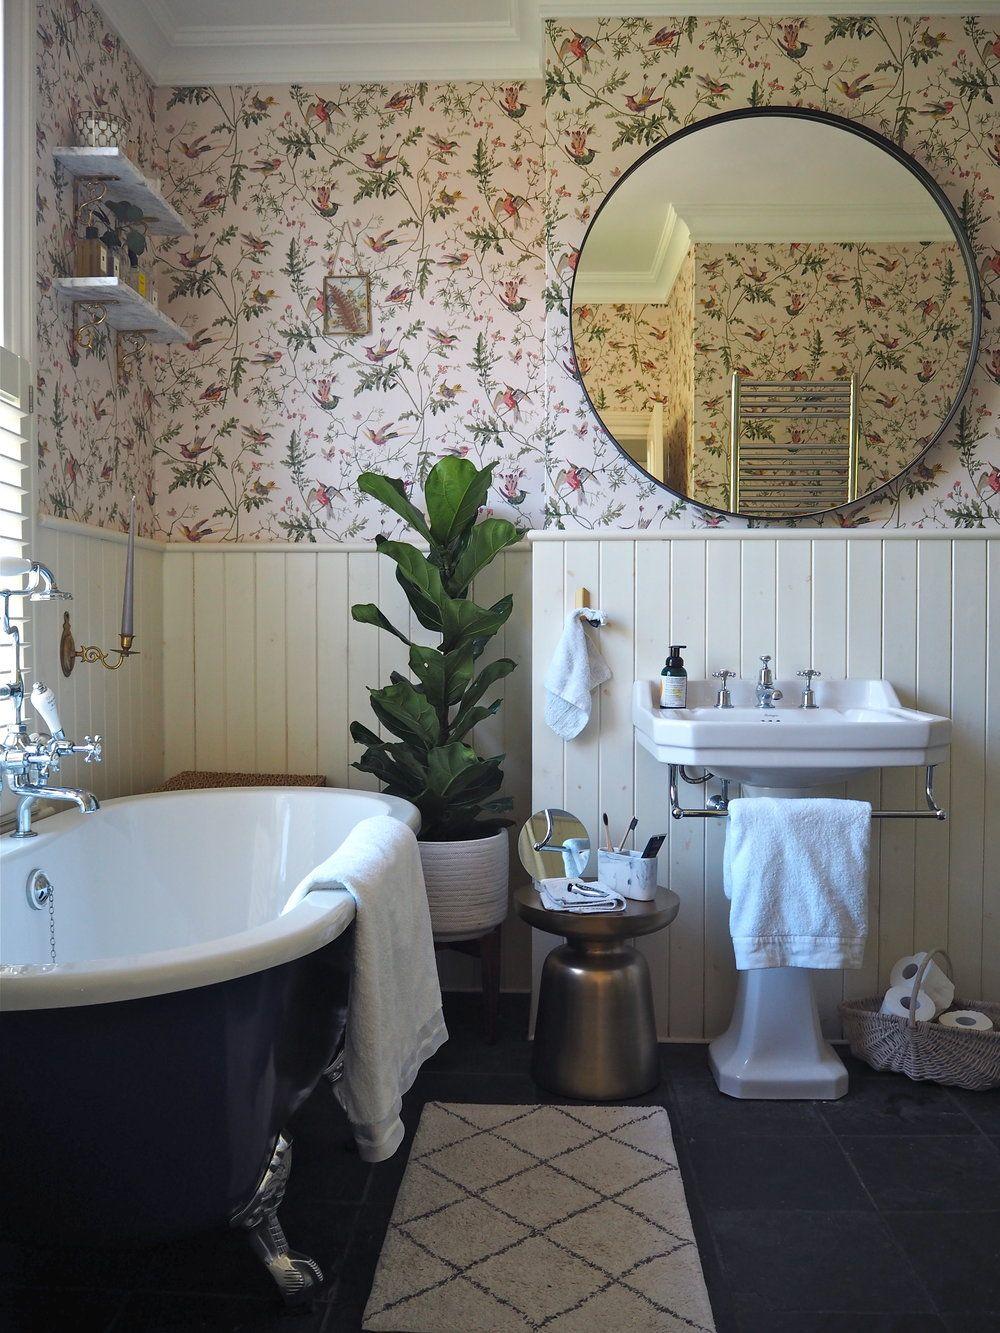 How To Hang A Large Mirror Melanie Lissack Interiors Bathroom Decor Modern White Bathroom Bathroom Pictures